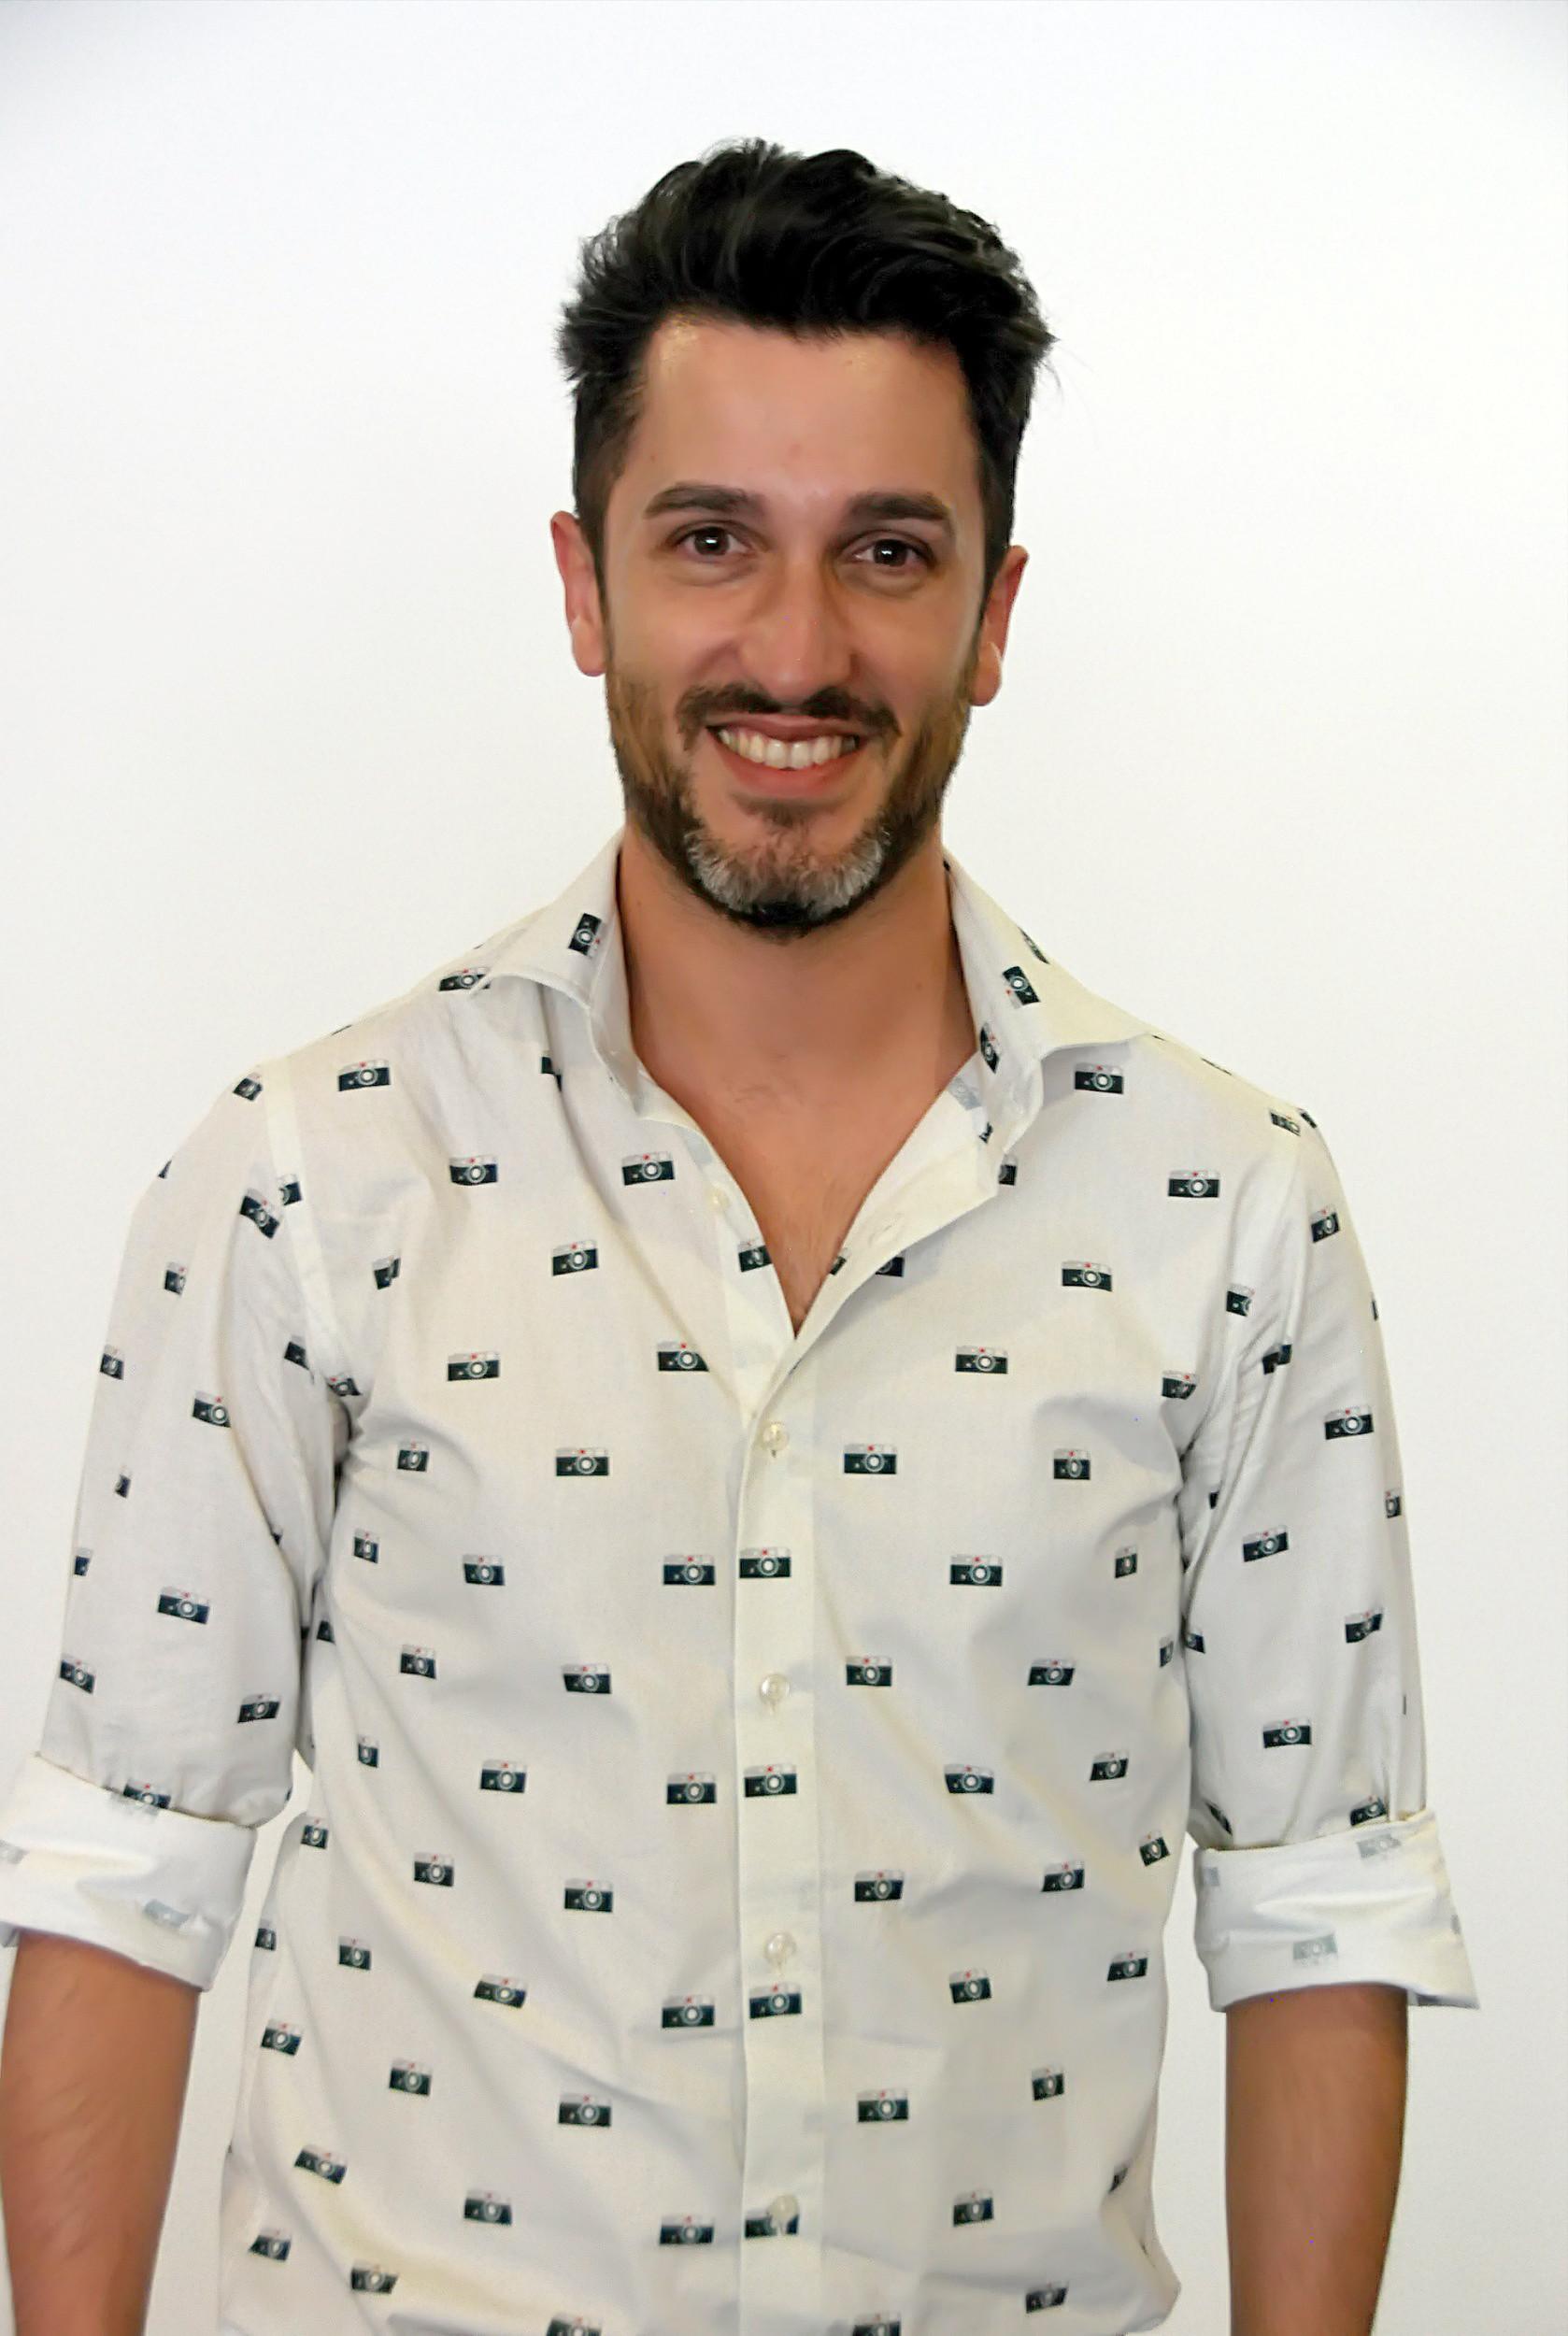 Jairo Alonso Caballero